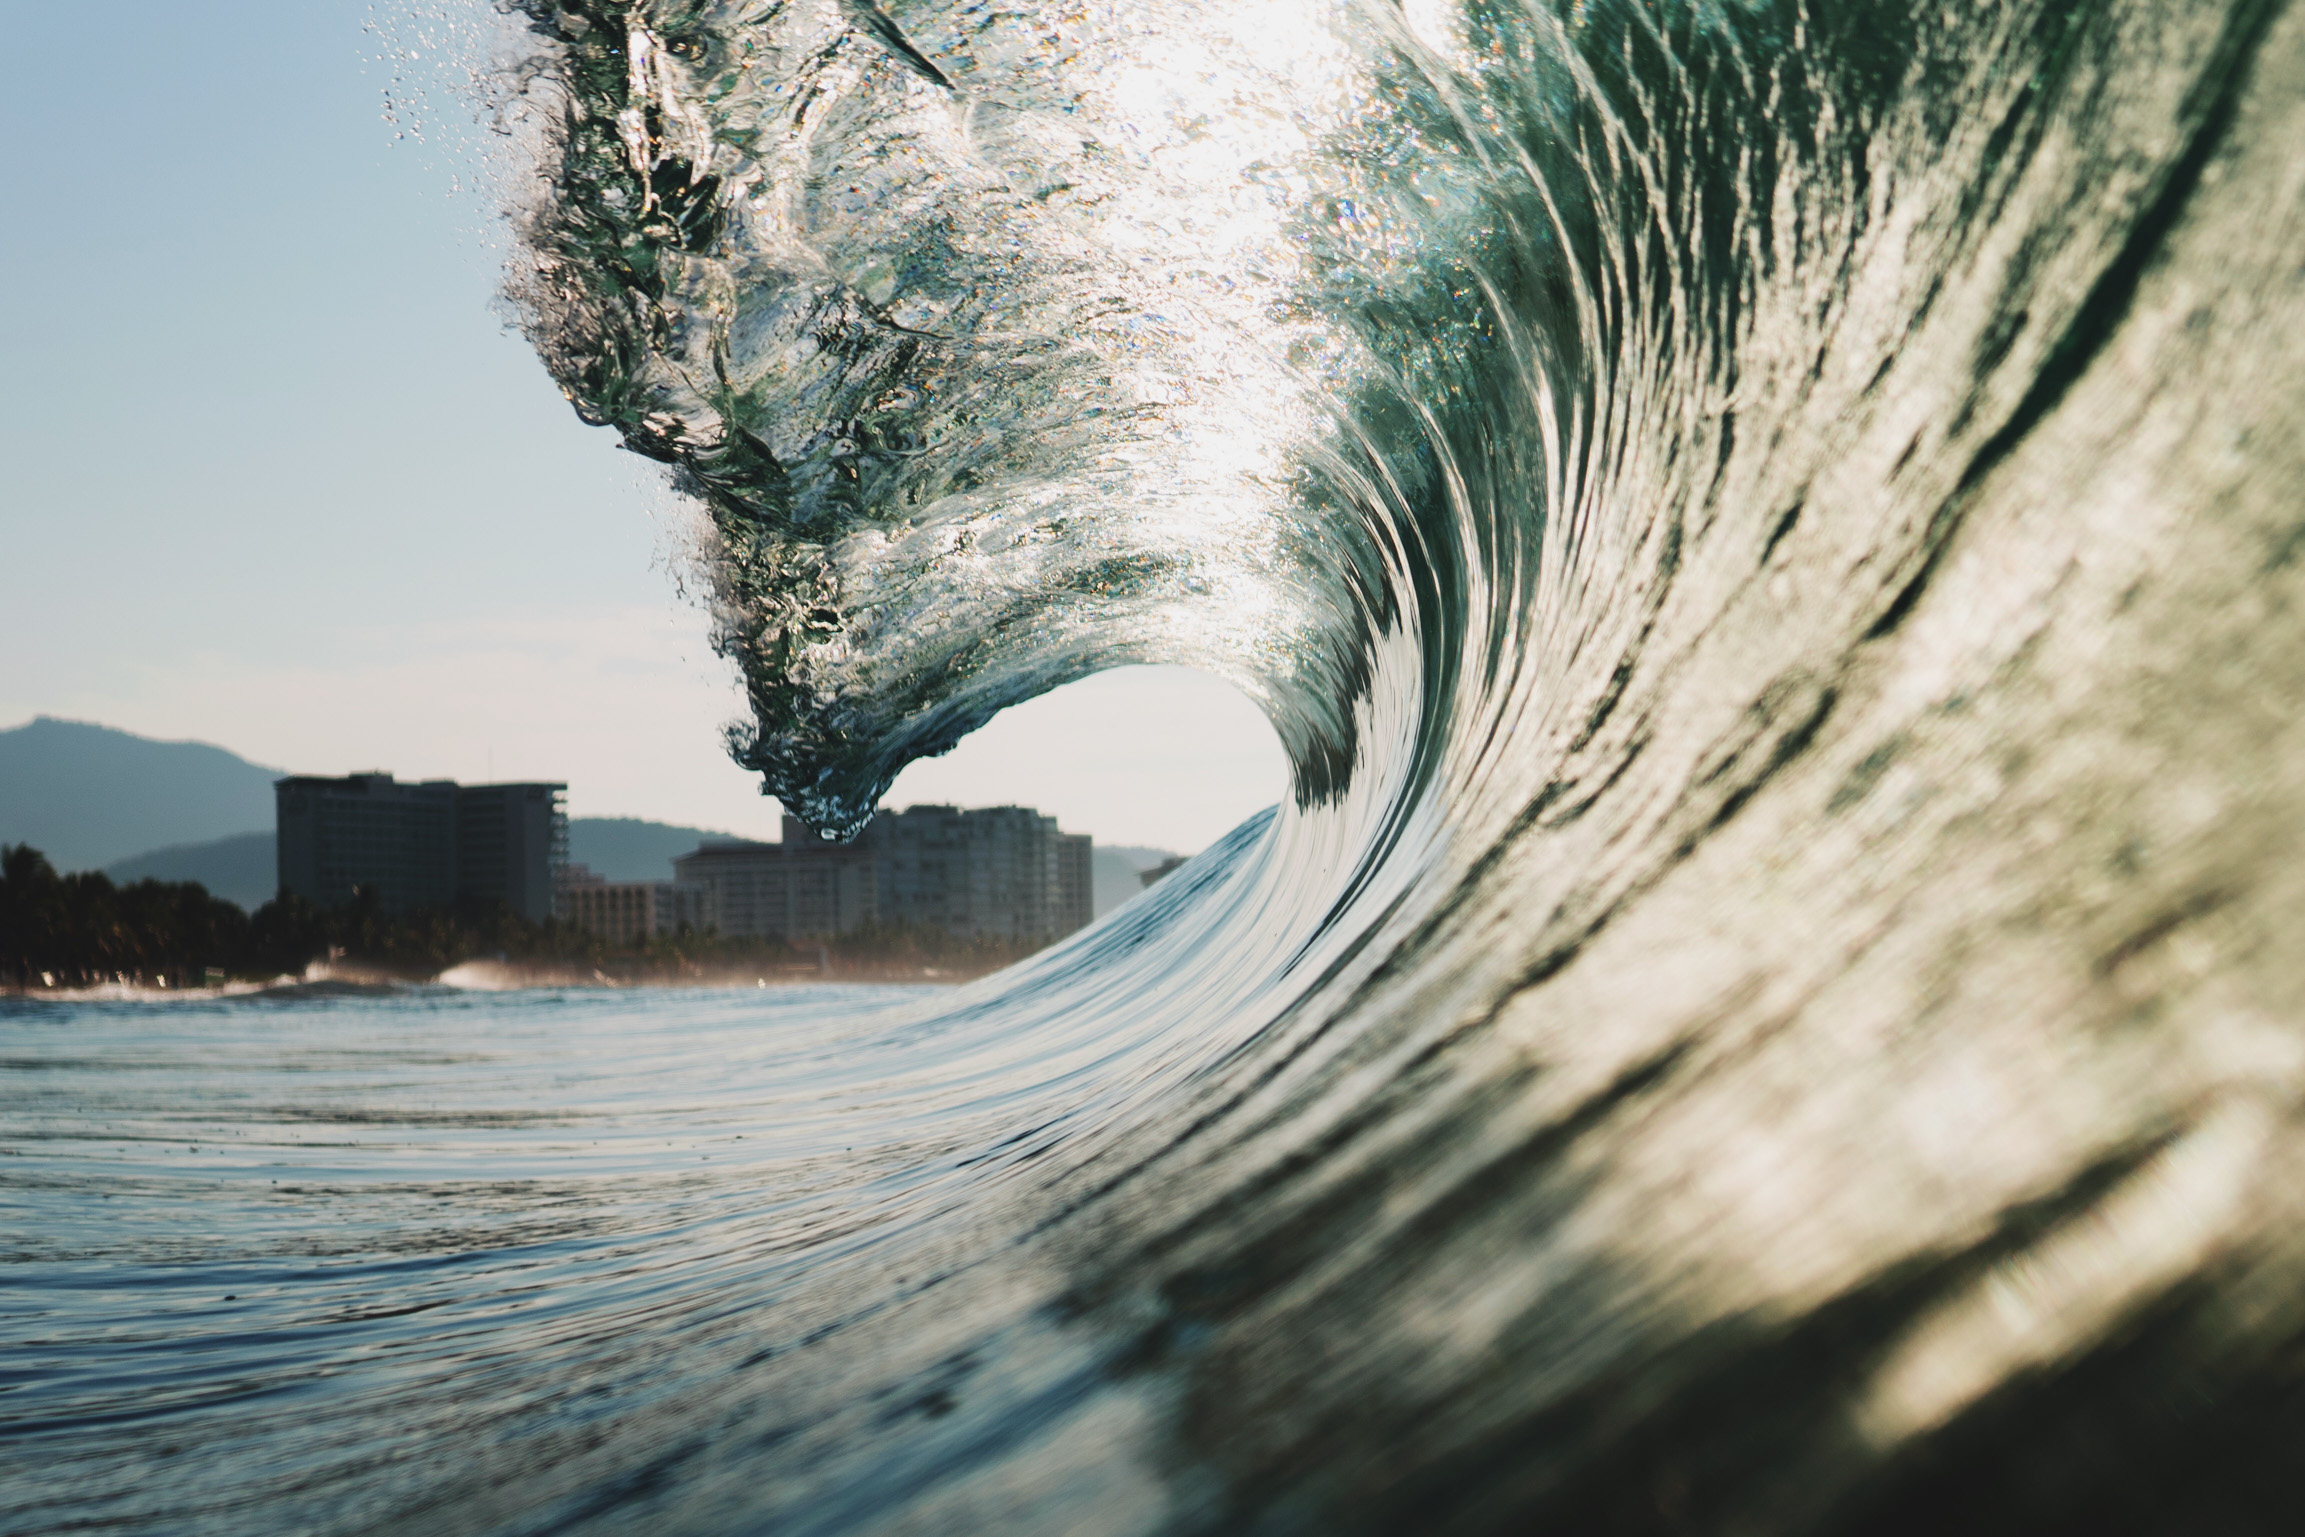 Surf-Mexico-Zihuatanejo-Sayulita-Ixtapa-Zihuatanejo-Diego-Cadena-Olas-Fotografia-Heiko-Bothe-50.jpg